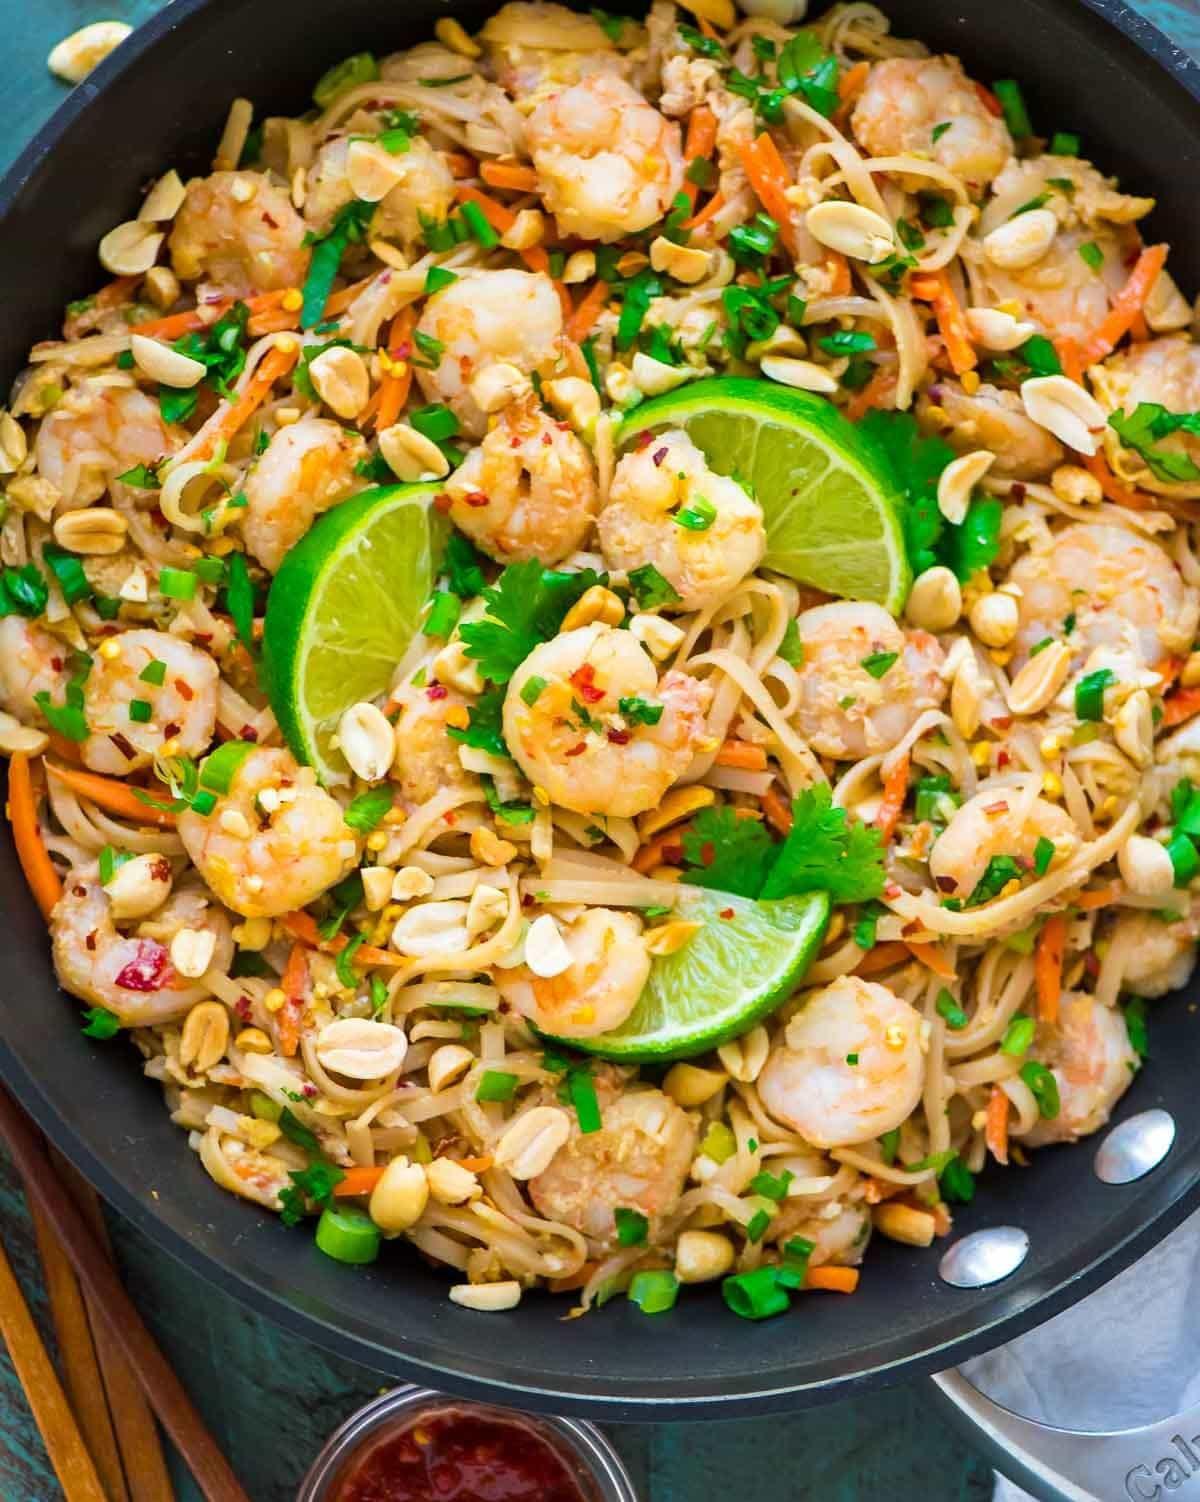 Healthy Thai Food Recipes  Healthy Shrimp Pad Thai